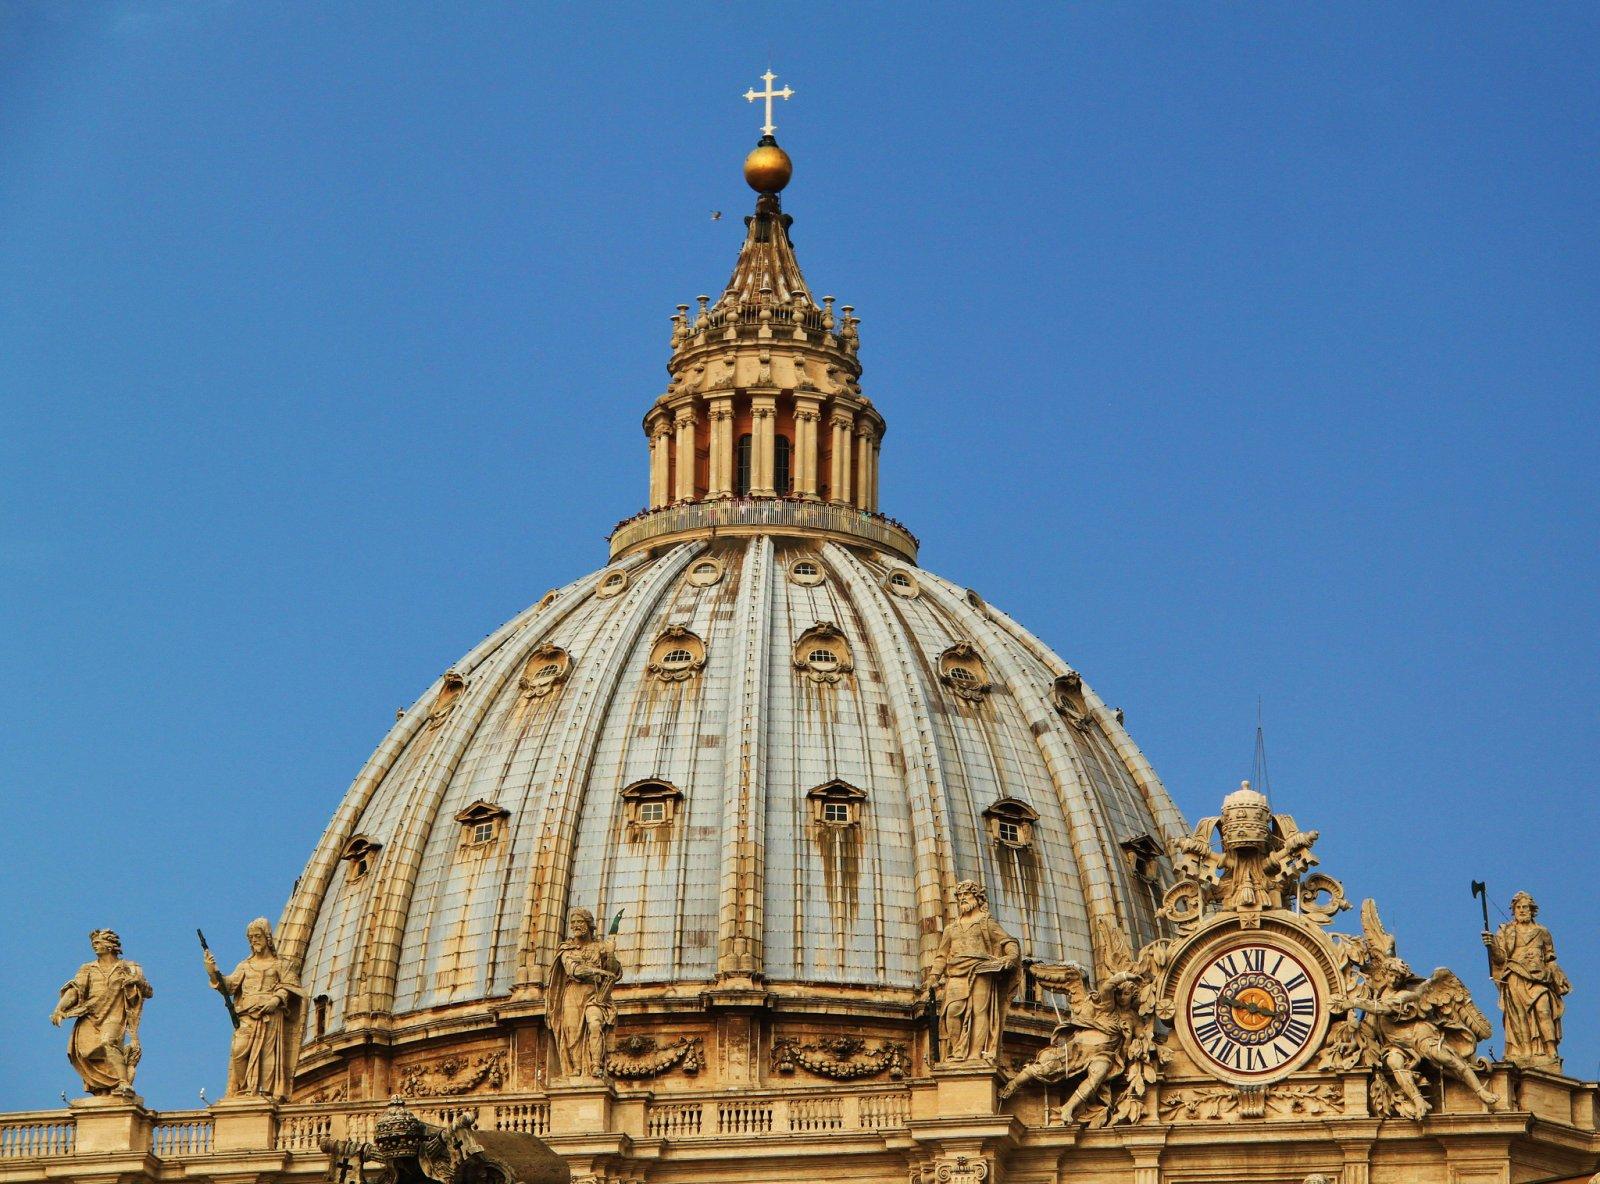 Экскурсия №2. «Тайны Ватикана»